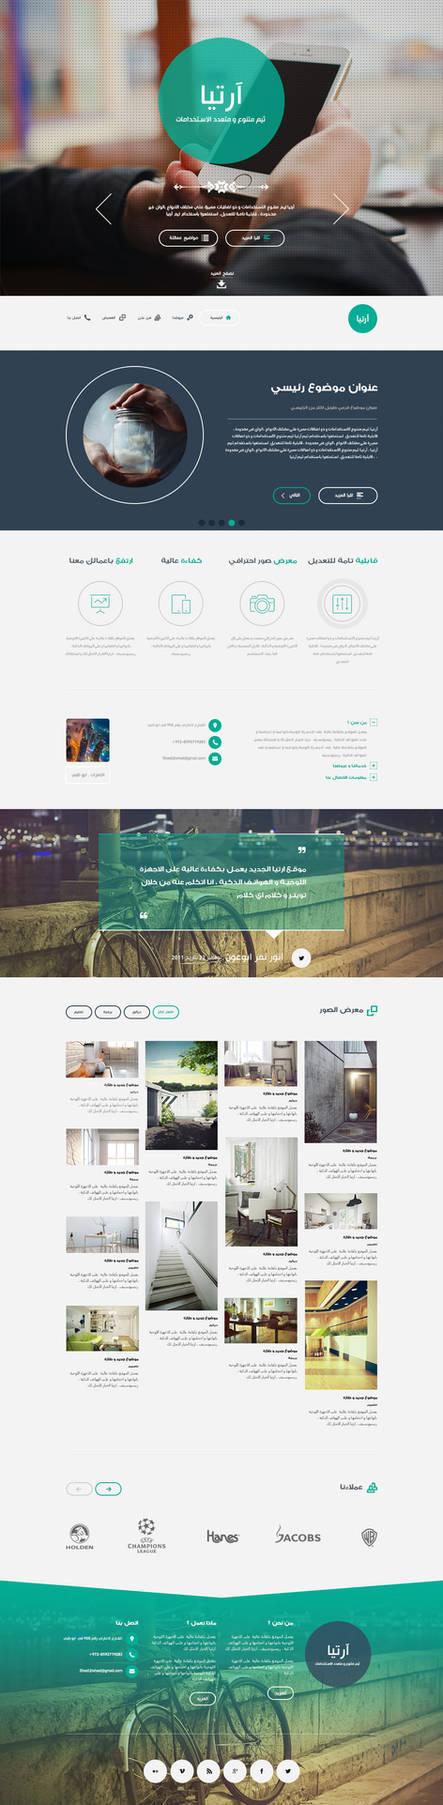 Artia theme - website